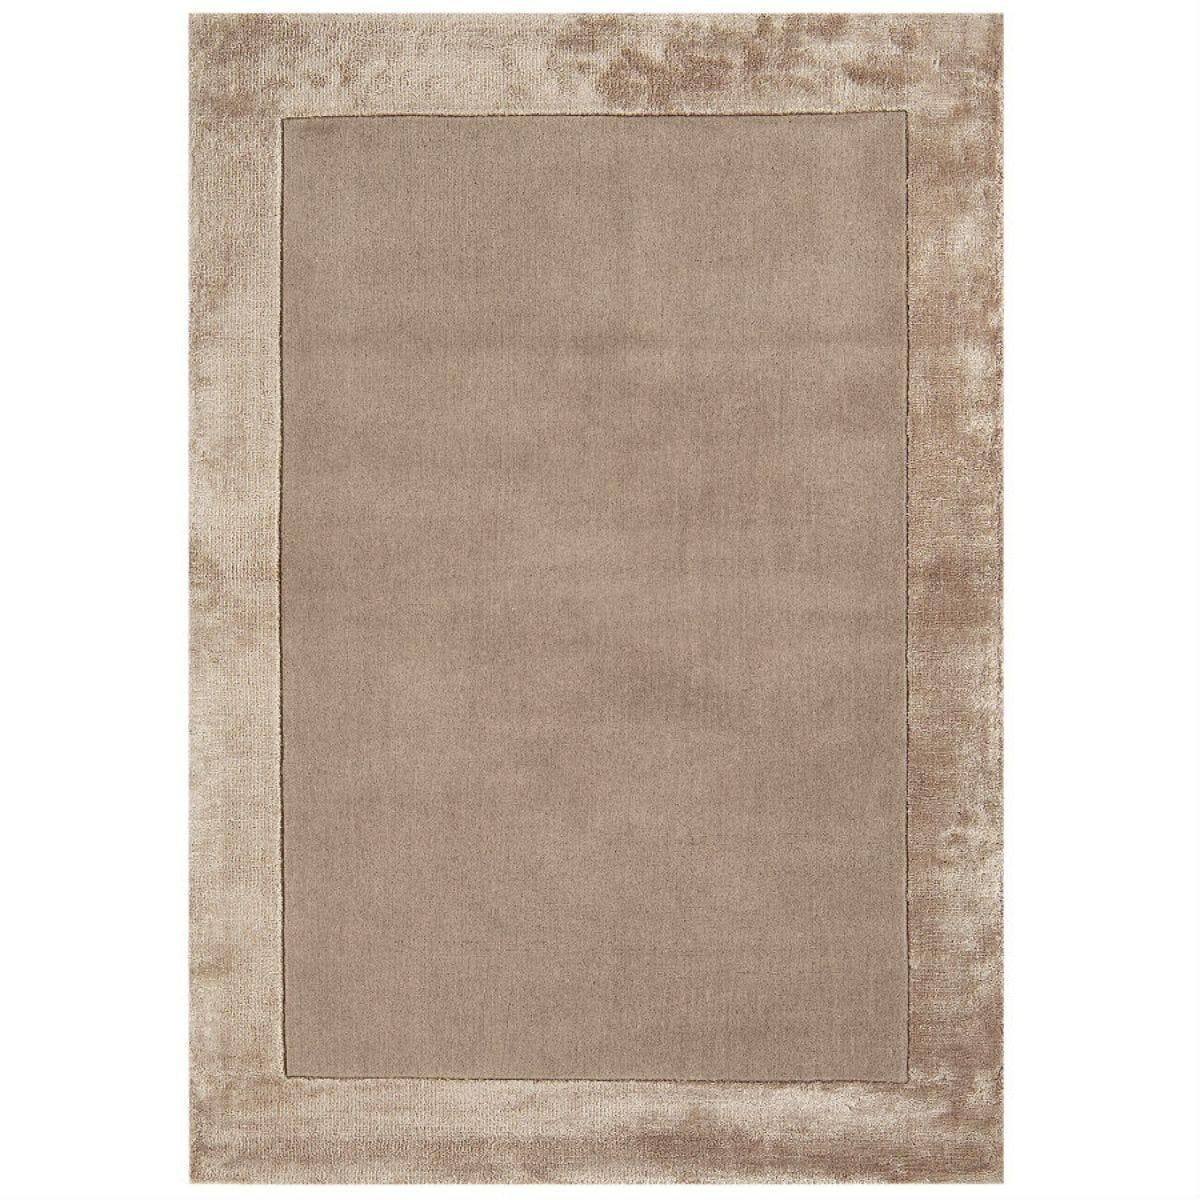 Asiatic Ascot Rug, 120 x 170cm - Sand